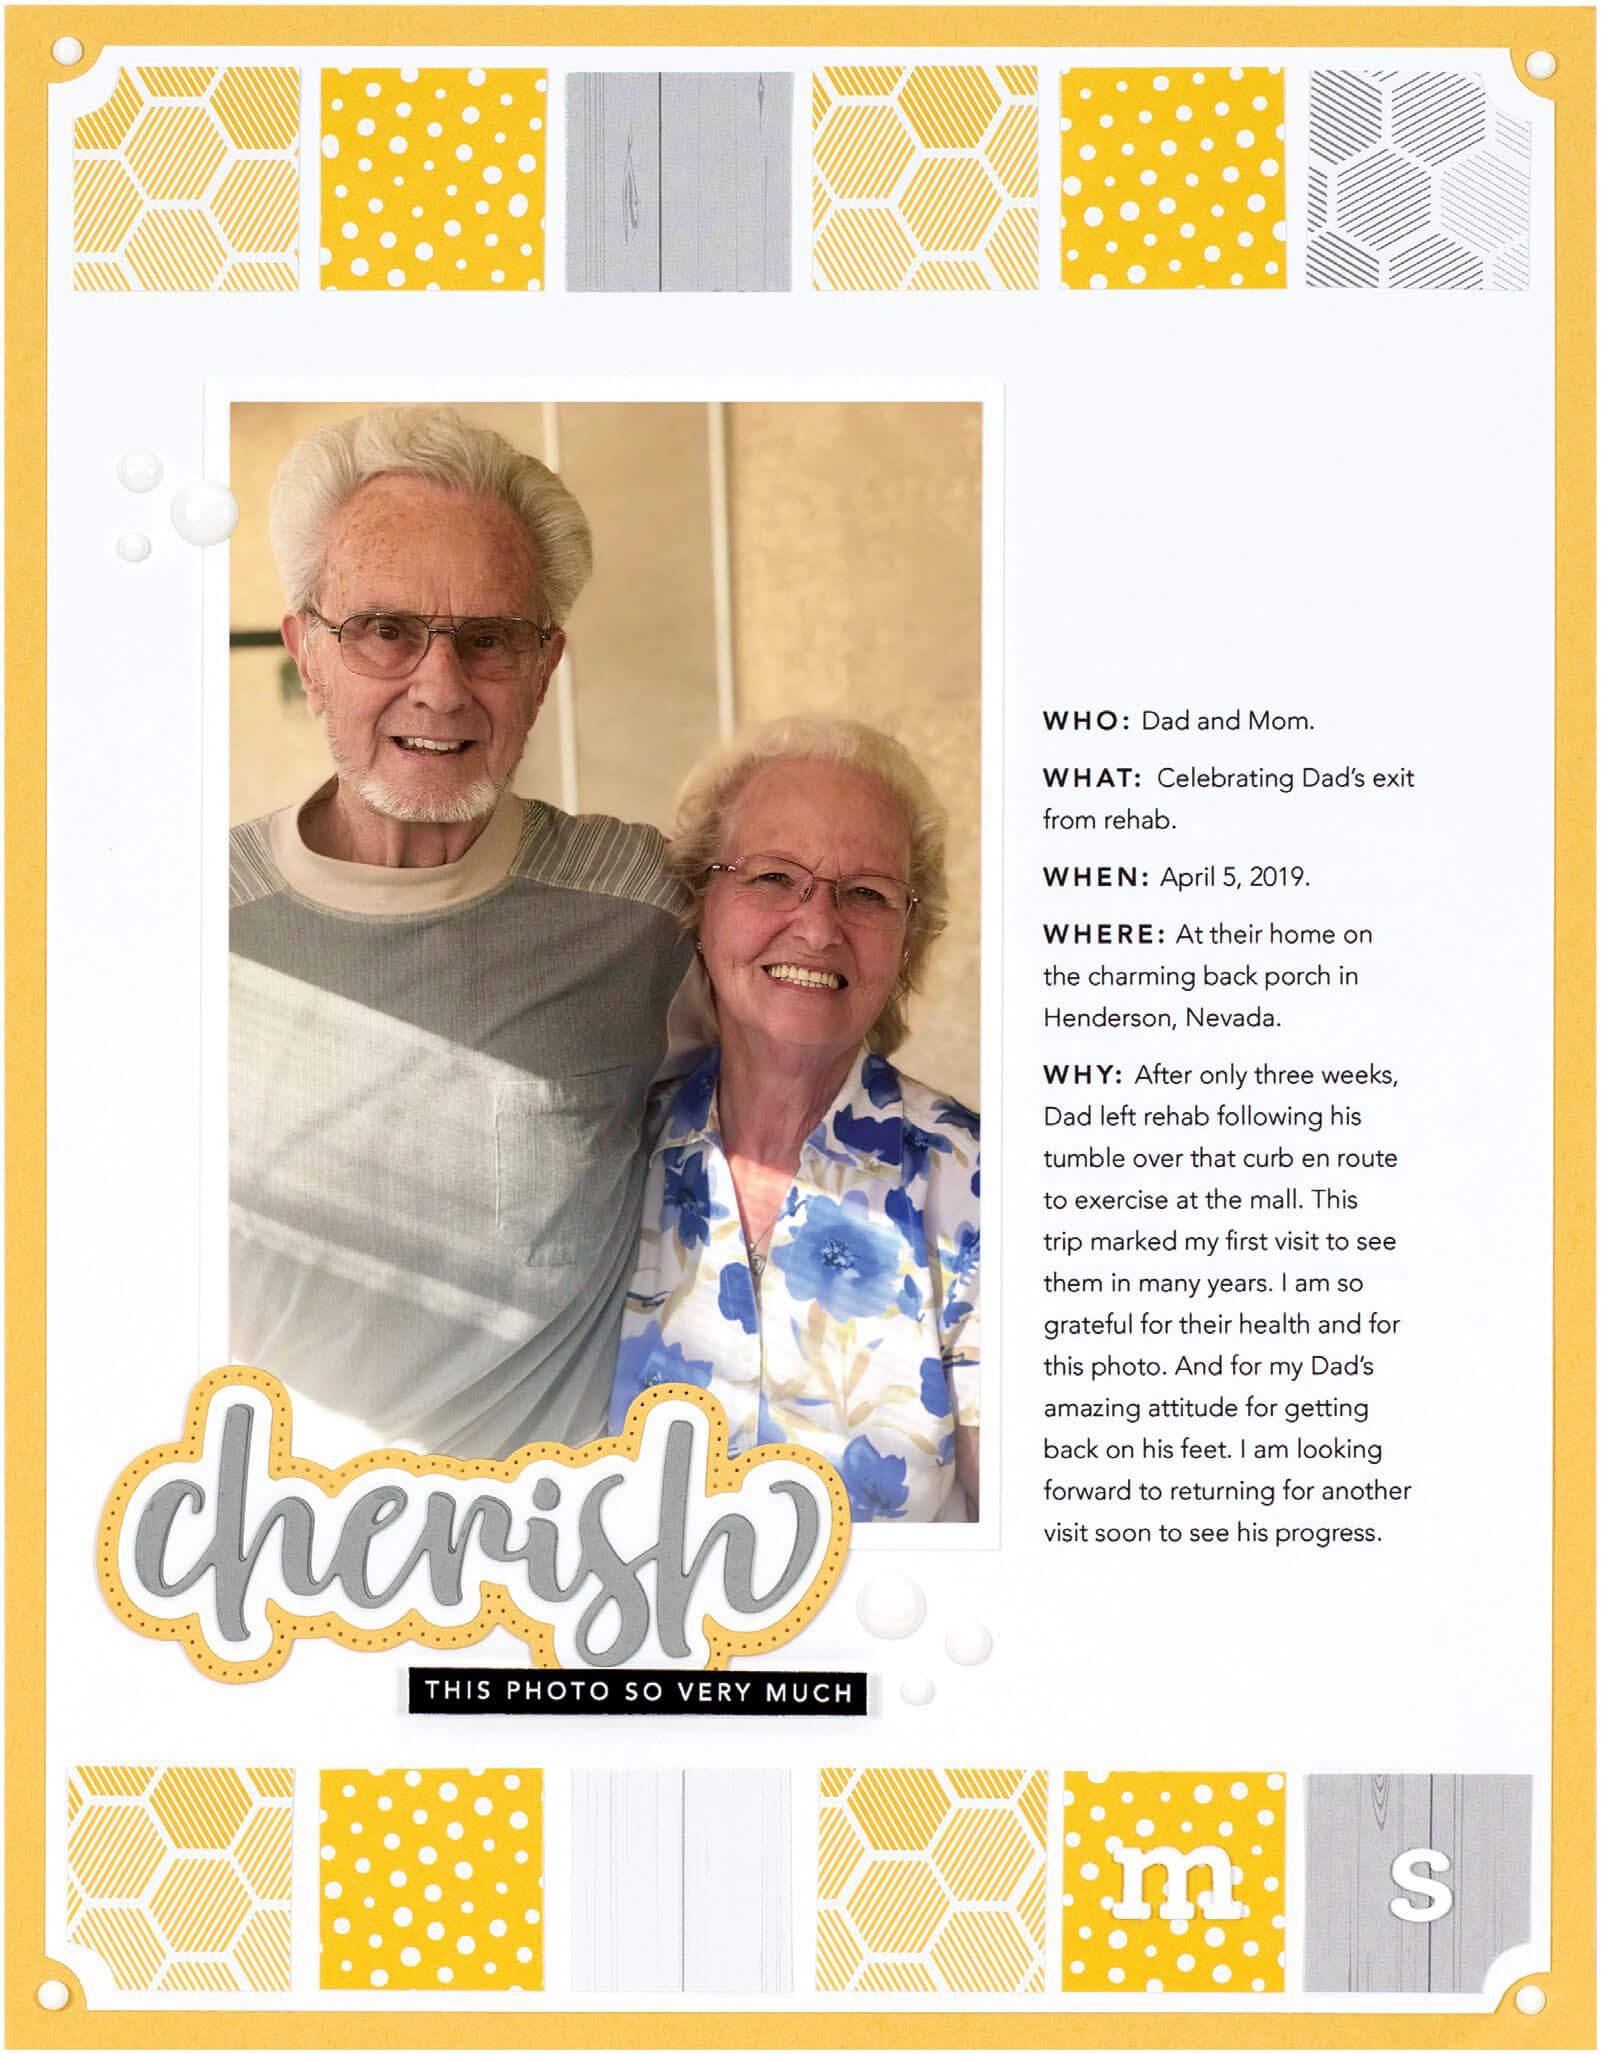 Scrapbook & Cards Today - Summer 2019 - Cherish layout by Cathy Zielske